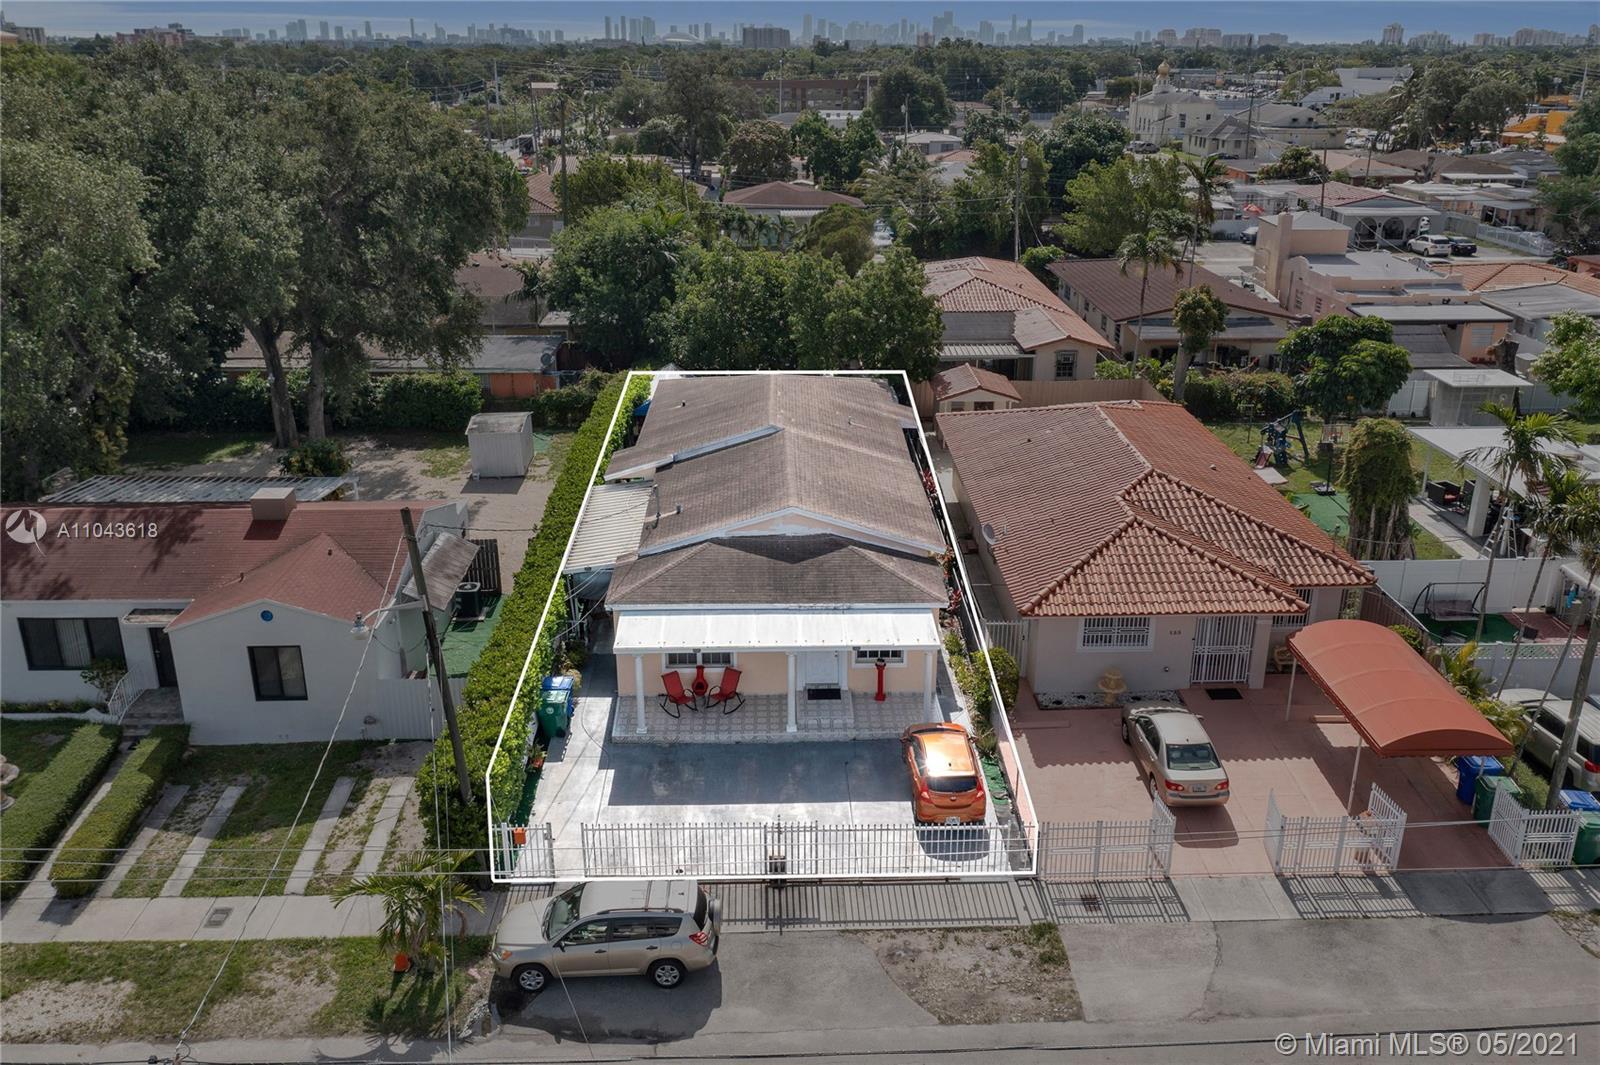 /  2193 sq. ft. $ 2021-05-17 0 Photo